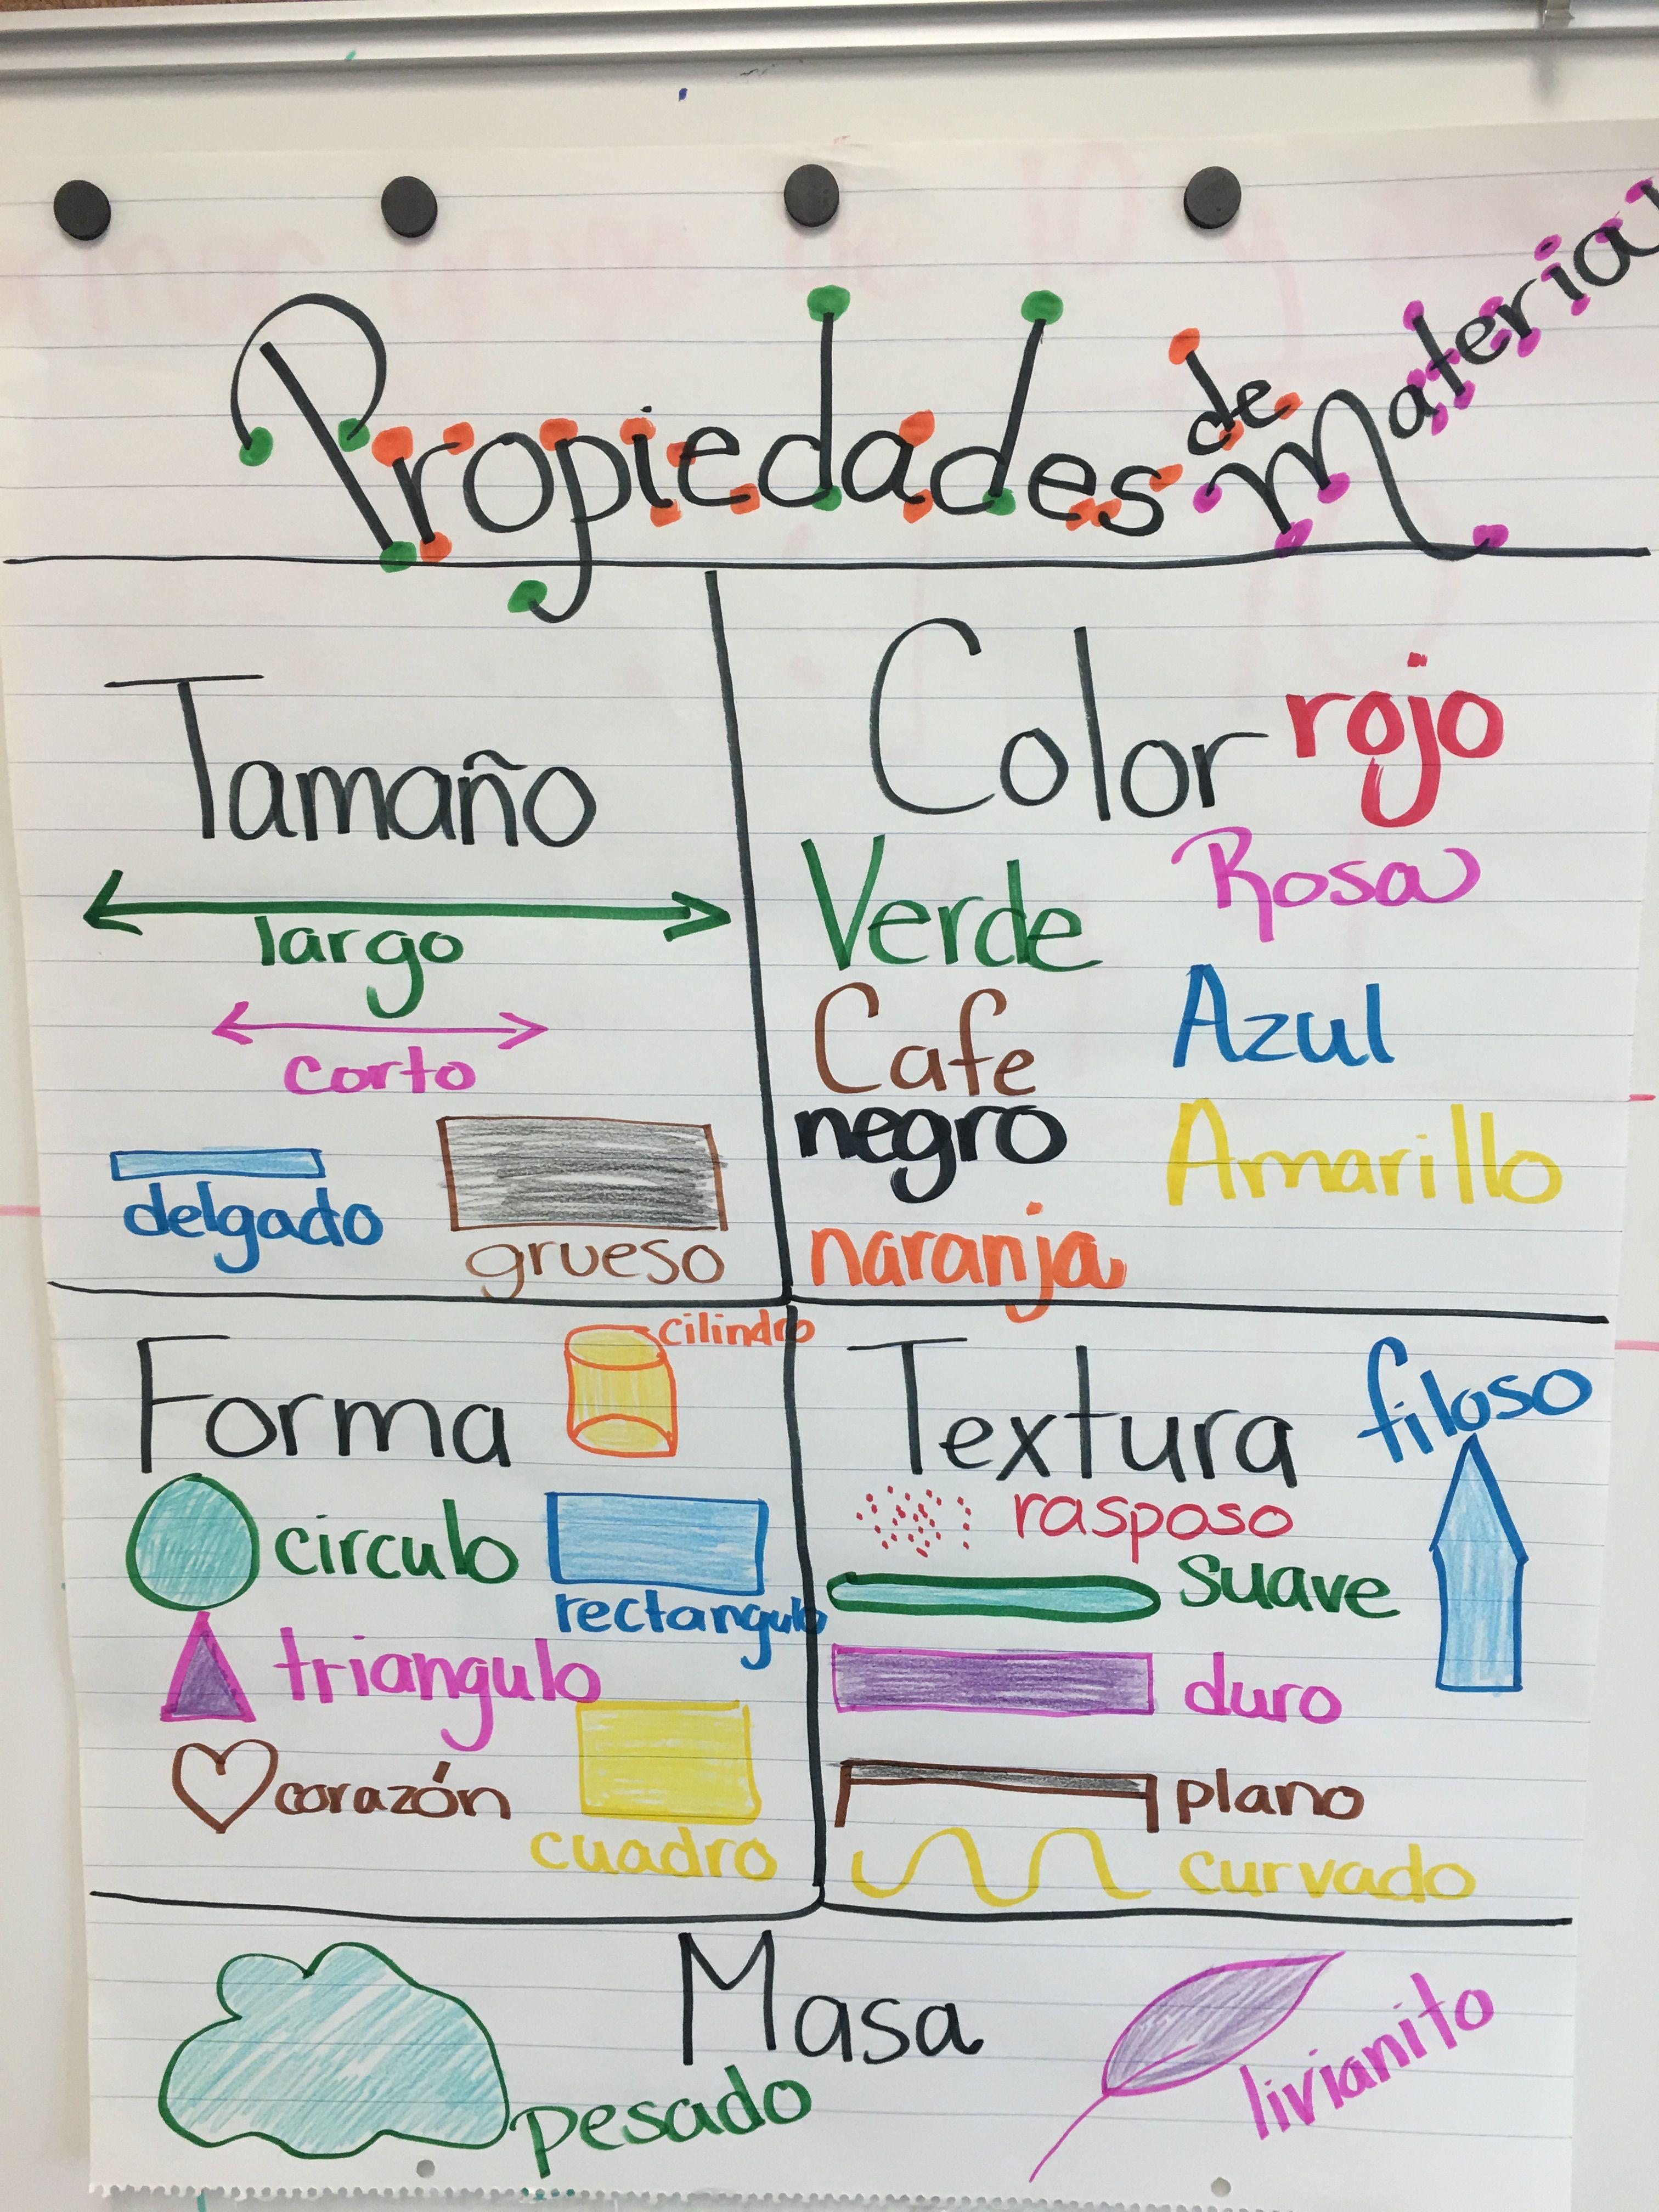 Properties Of Matter In Spanish Propiedades De Materia Scienc